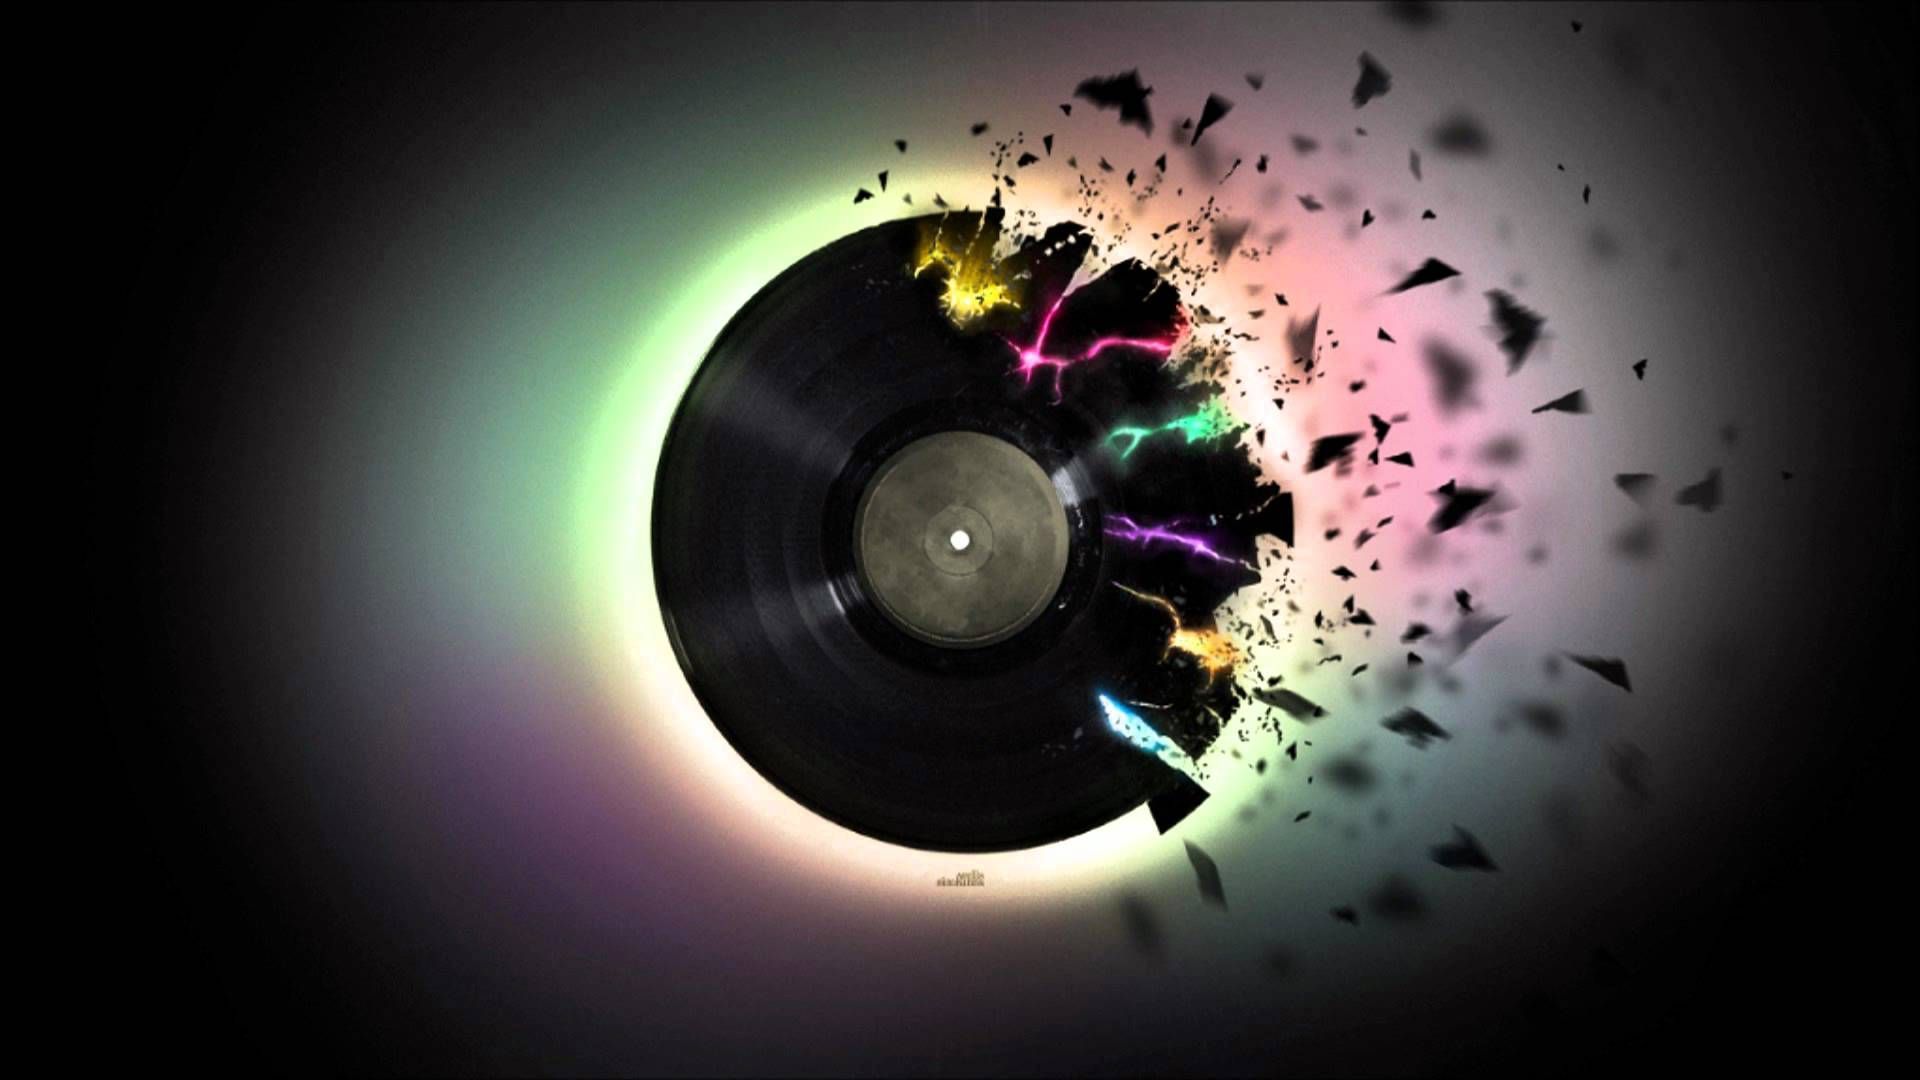 Hq Version Nalepa Monday The Glitch Mob Remix şarkılar Müzik Plak çalar